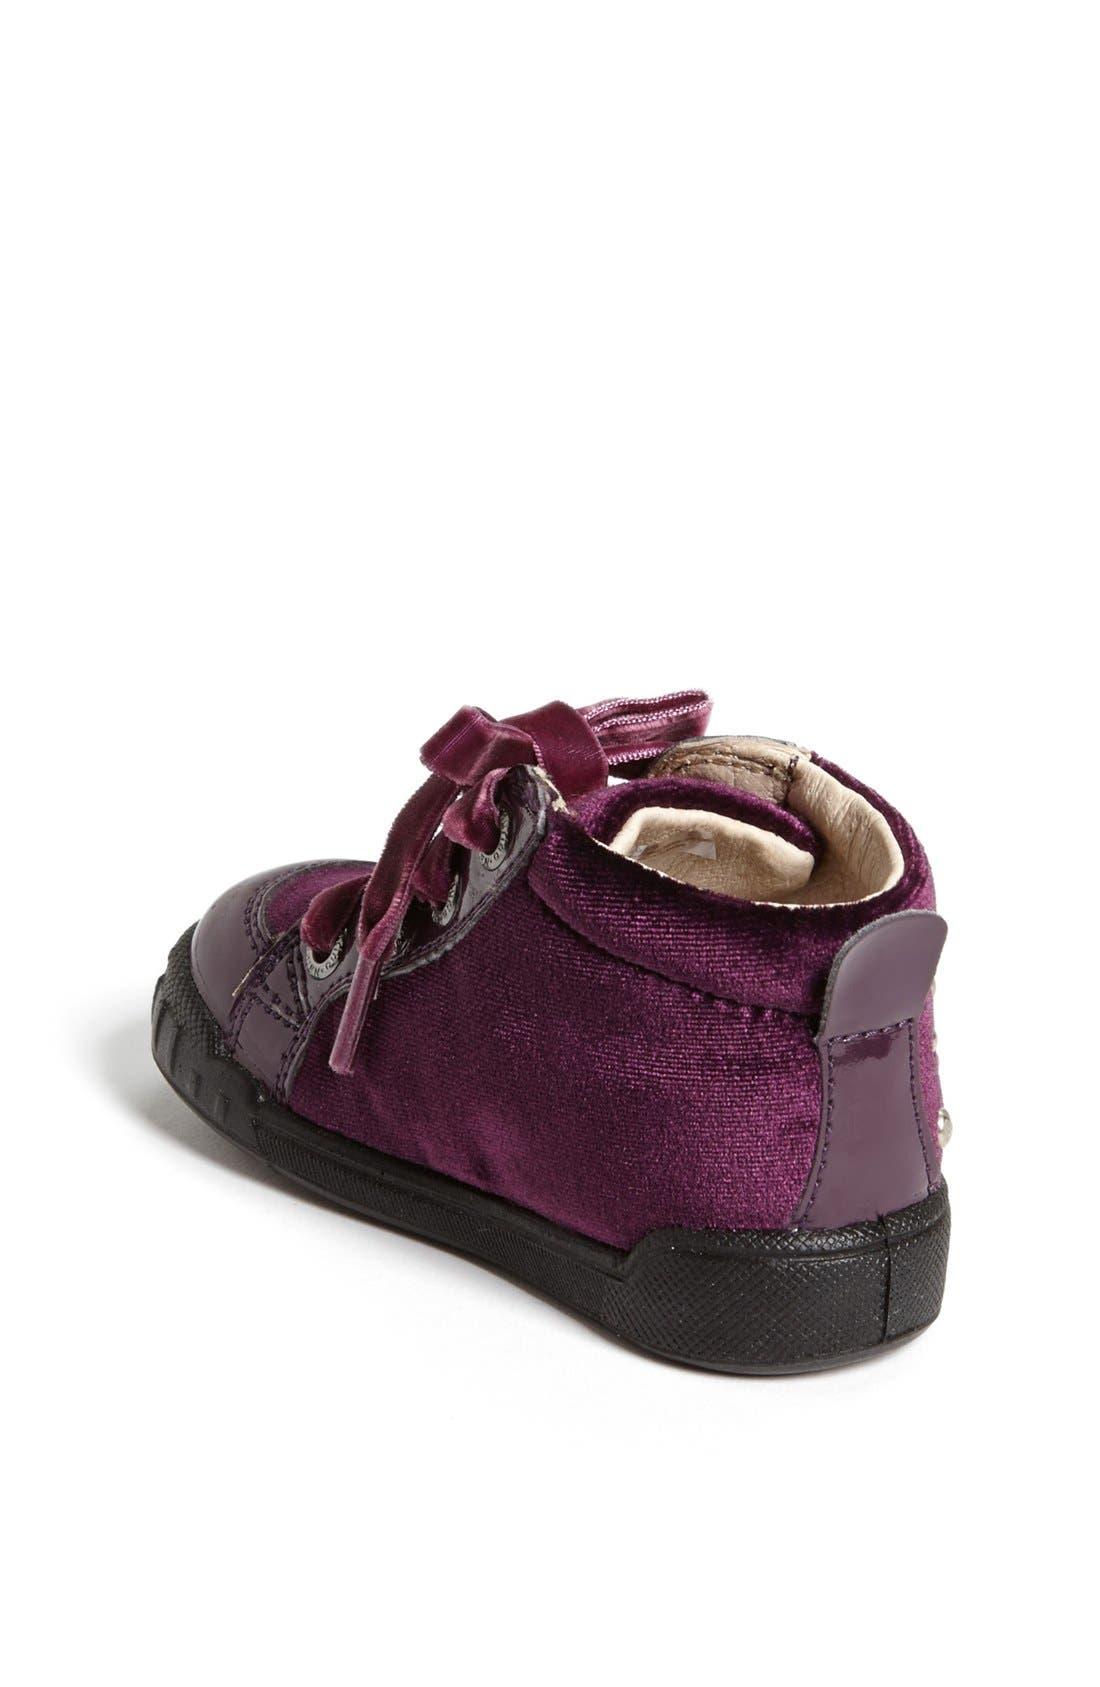 Alternate Image 2  - Naturino 'Falcotto - 1203' Sneaker (Baby & Walker)